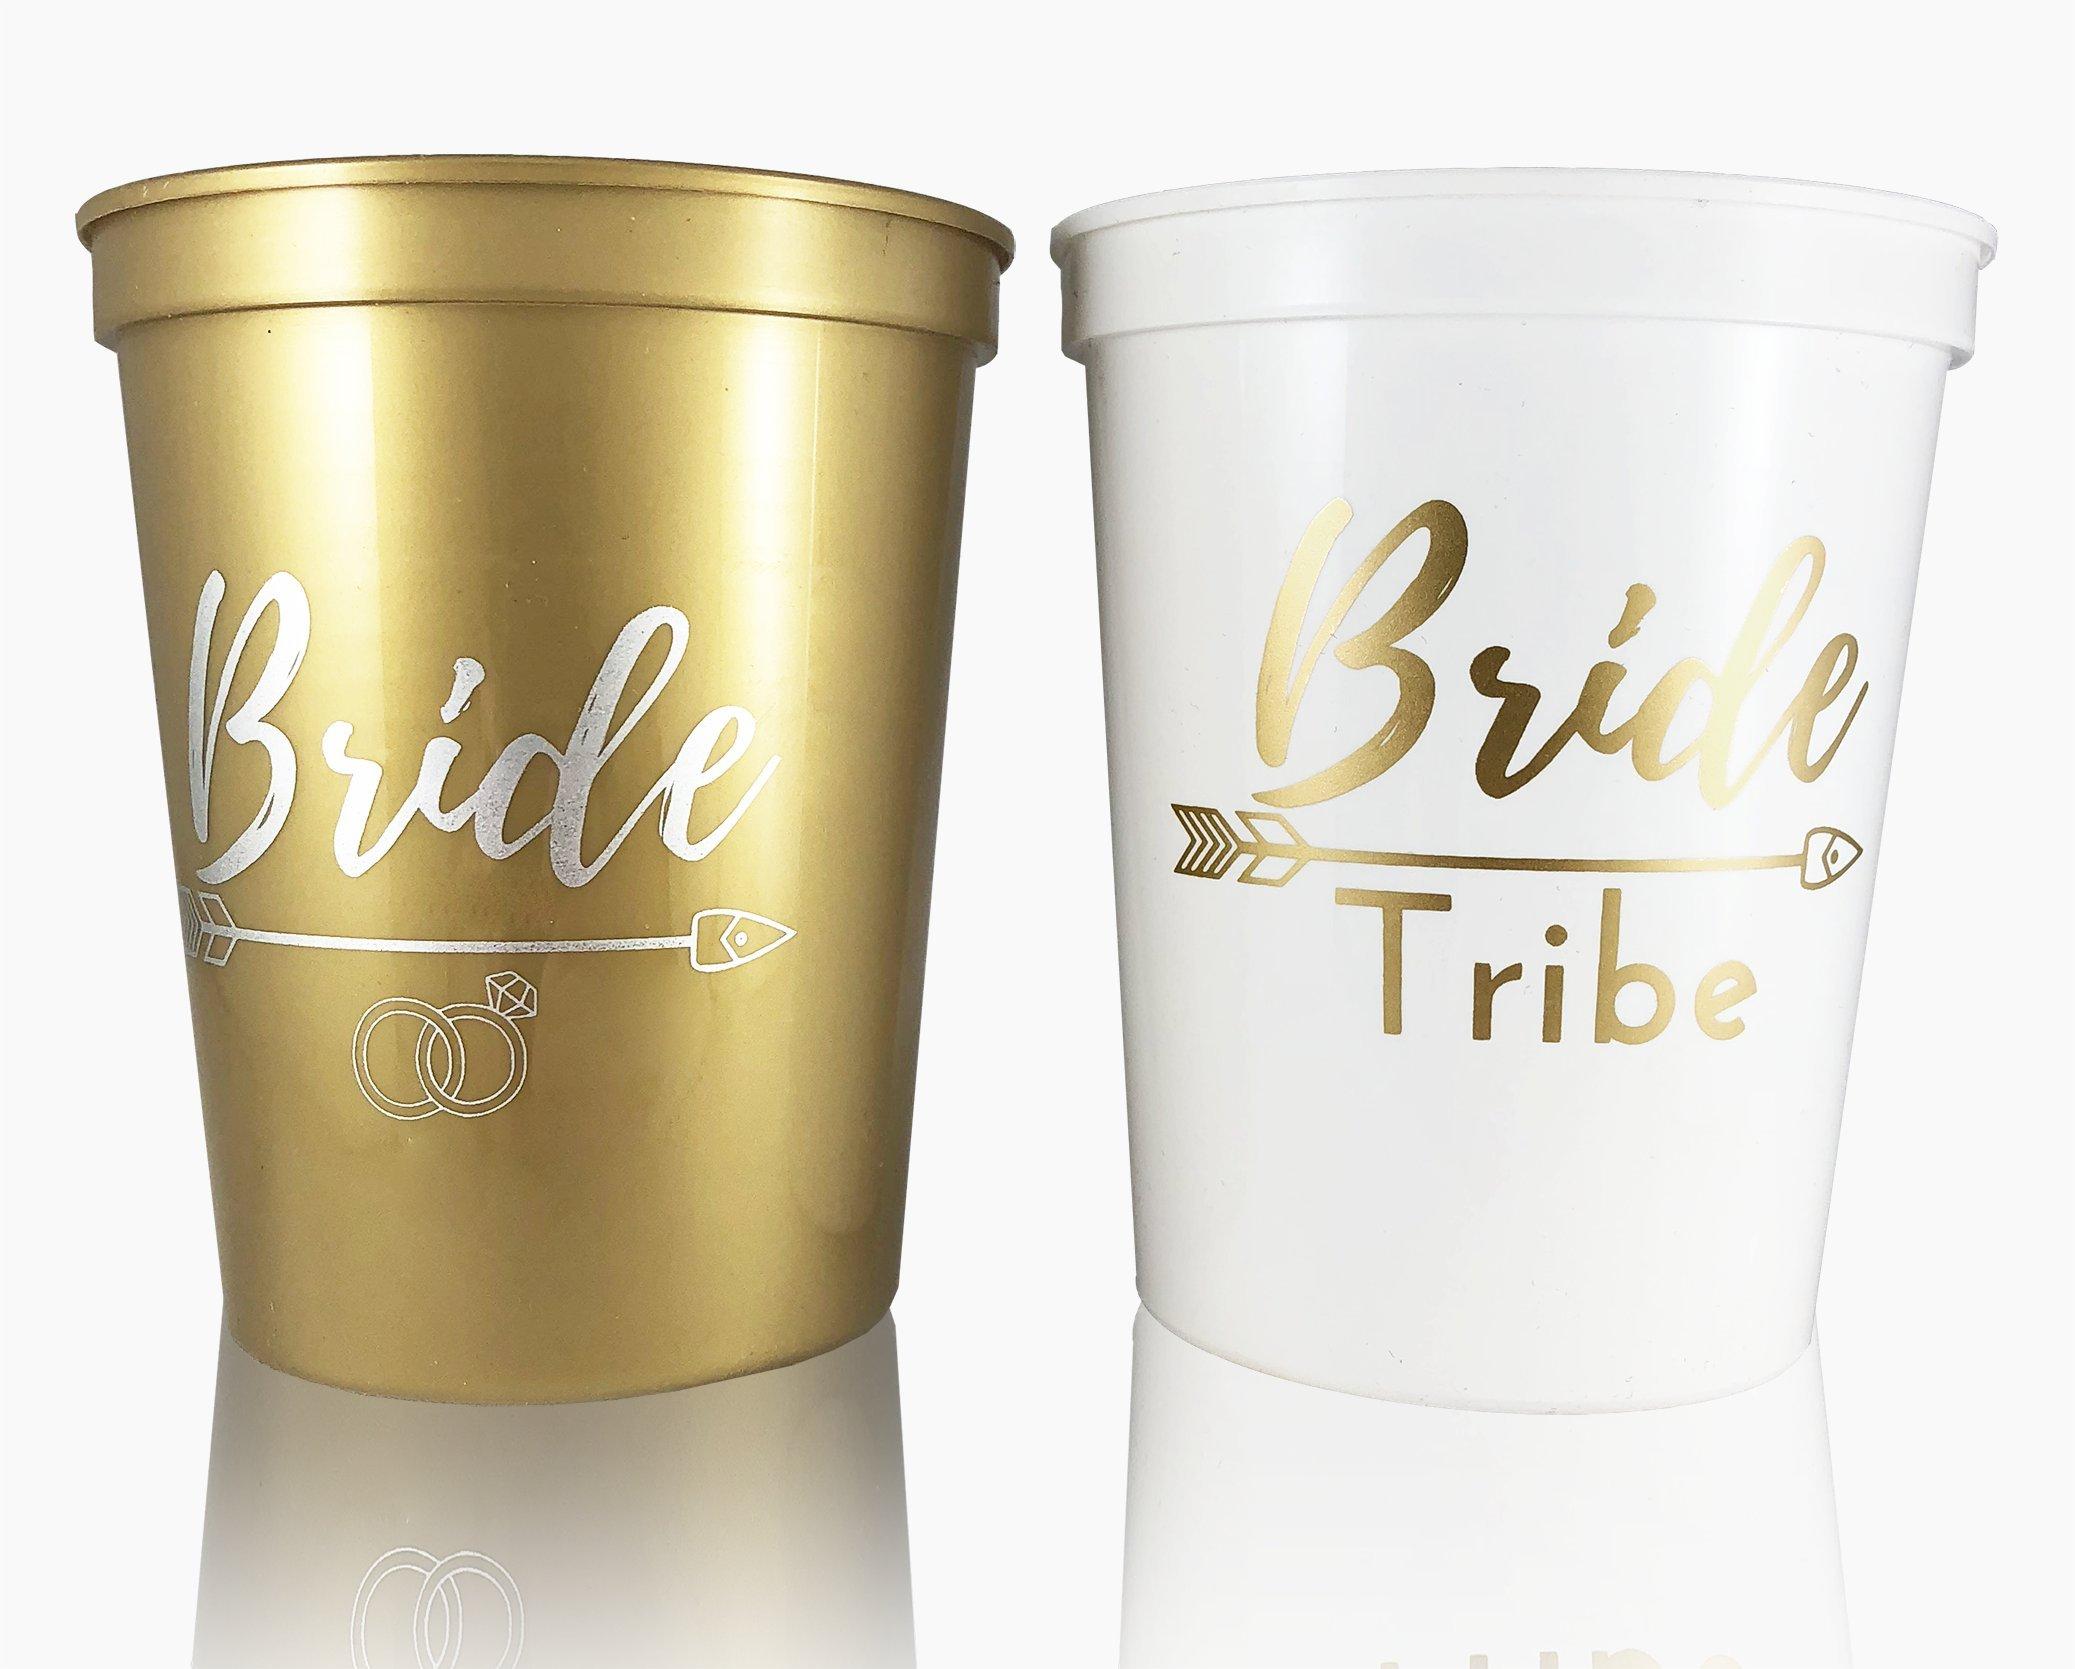 #glamist Bride Tribe Cups - White & Gold 16 oz Plastic Cup Set for Weddings, Bridal Showers, Engagement & Bachelorette Parties …